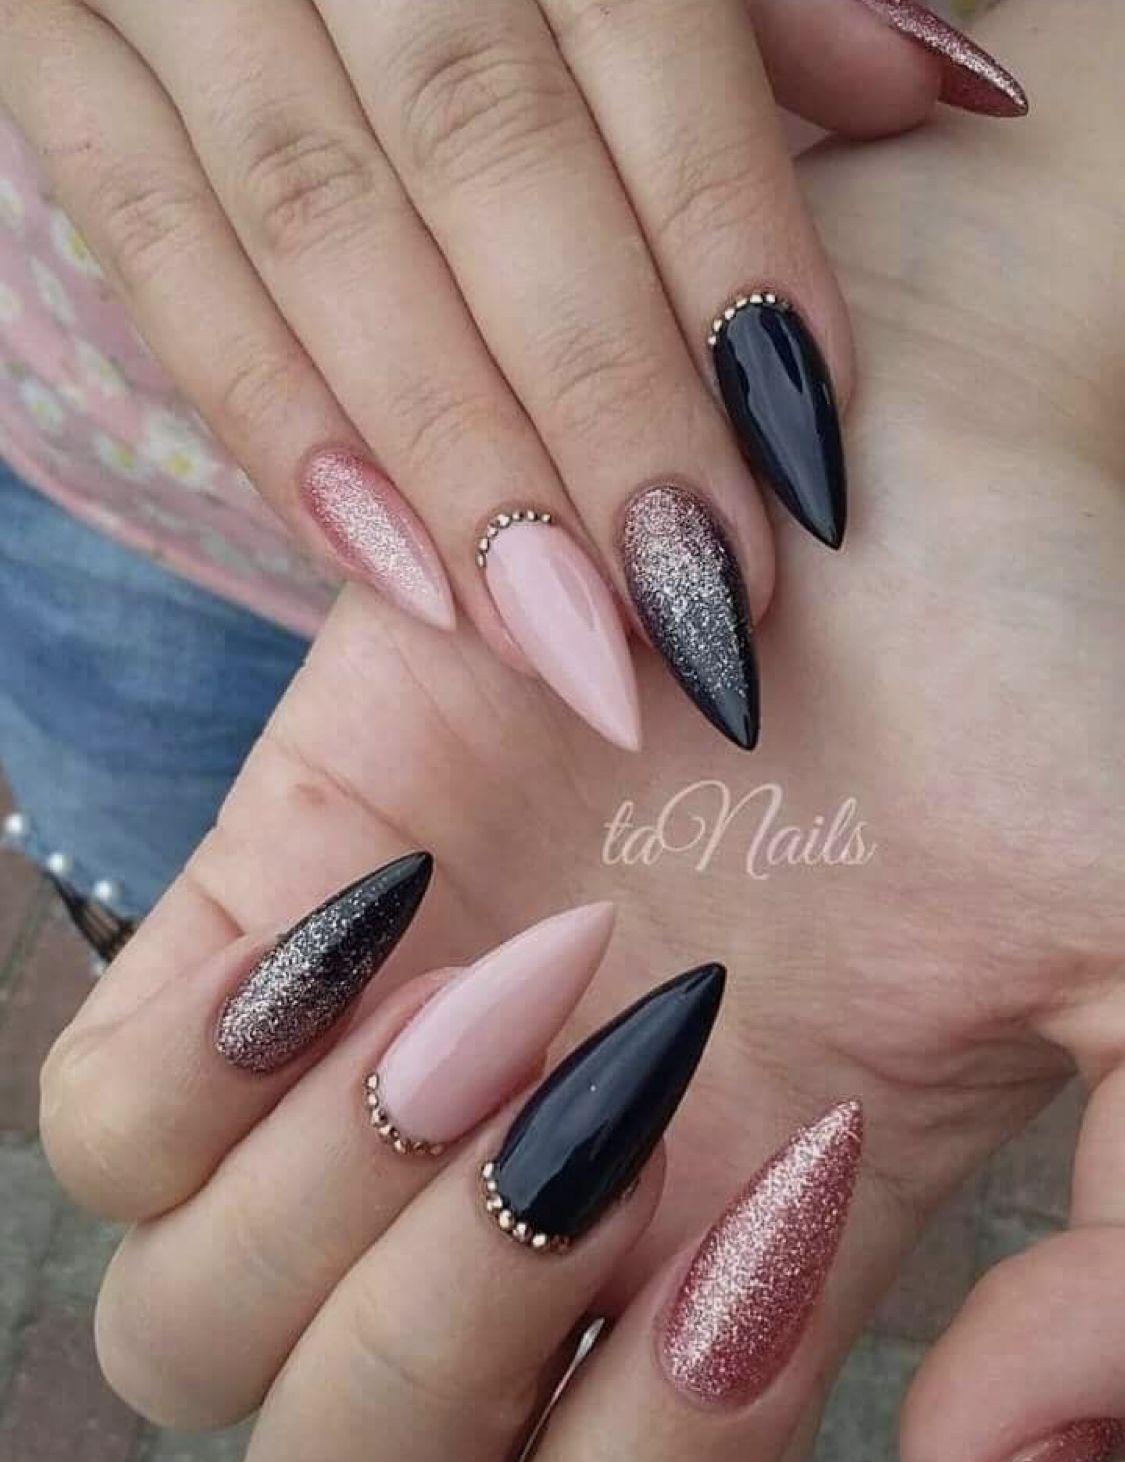 Pin by Christina on nail designs